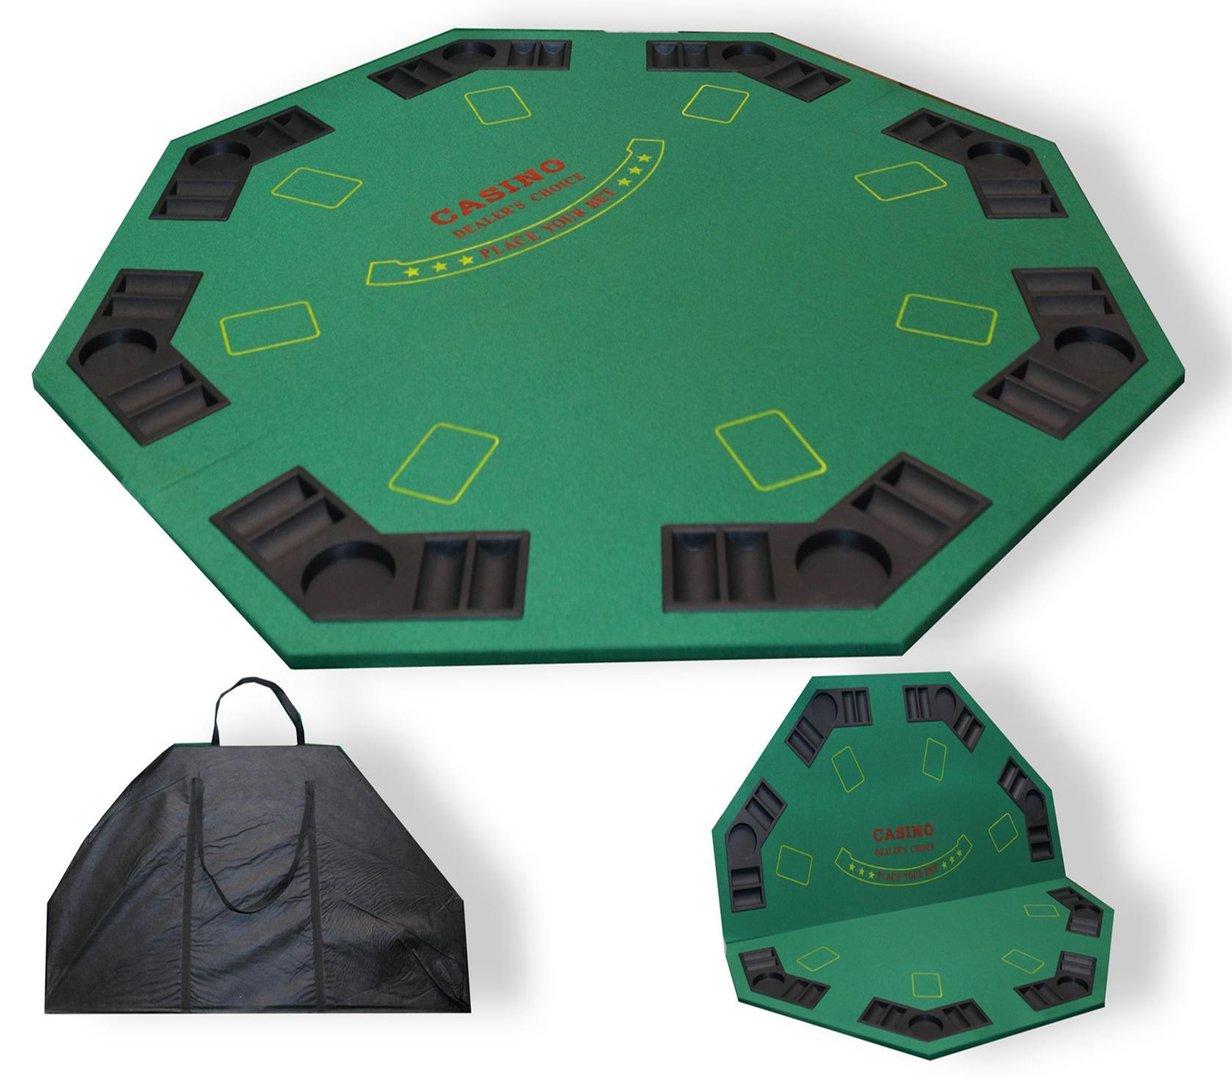 Dessus De Table Poker Octogonal 2 Parties